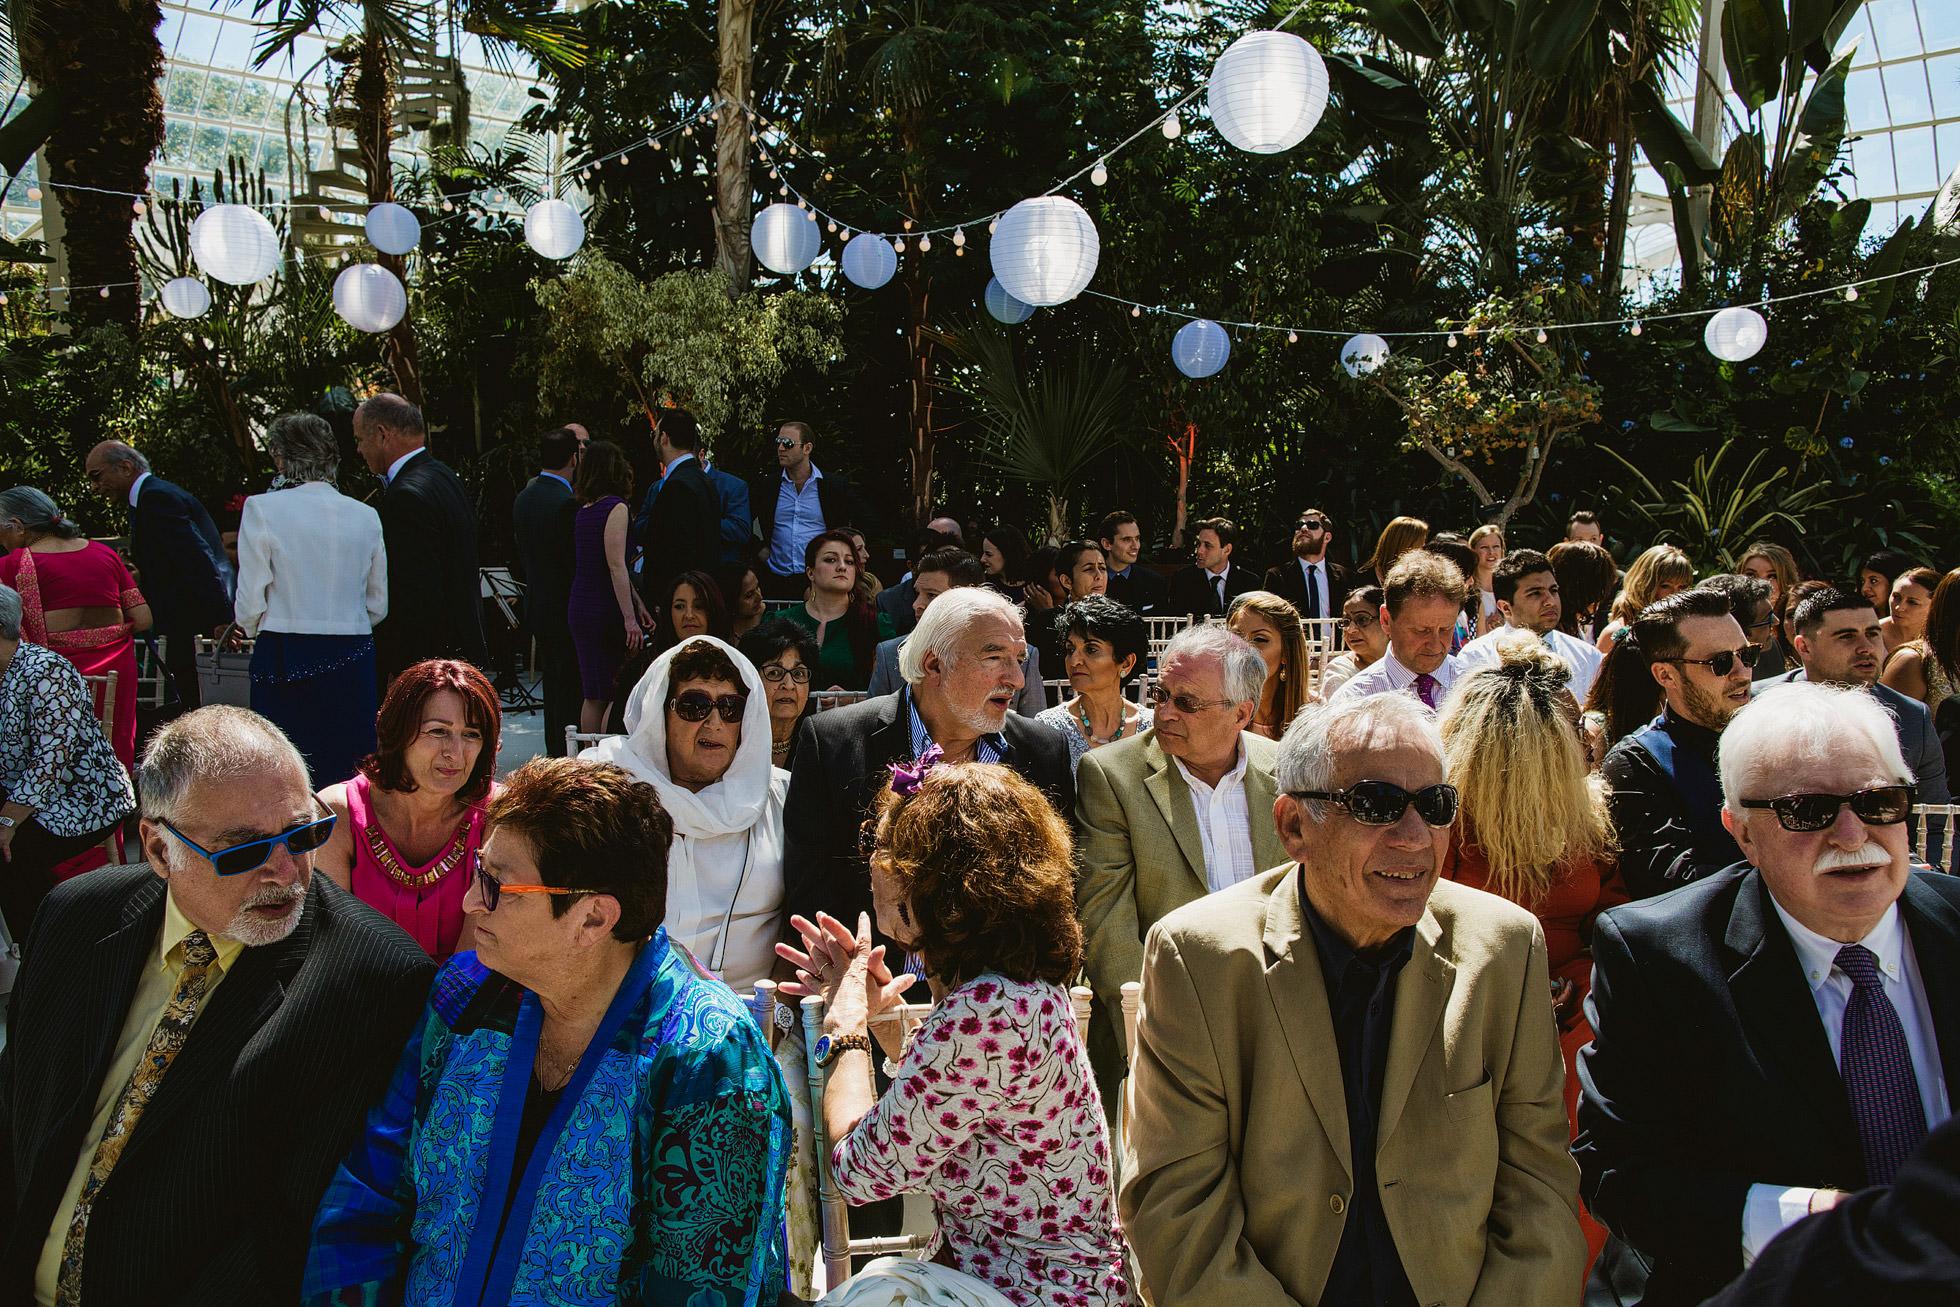 Titanic Hotel and Sefton Park Palm House Weddings